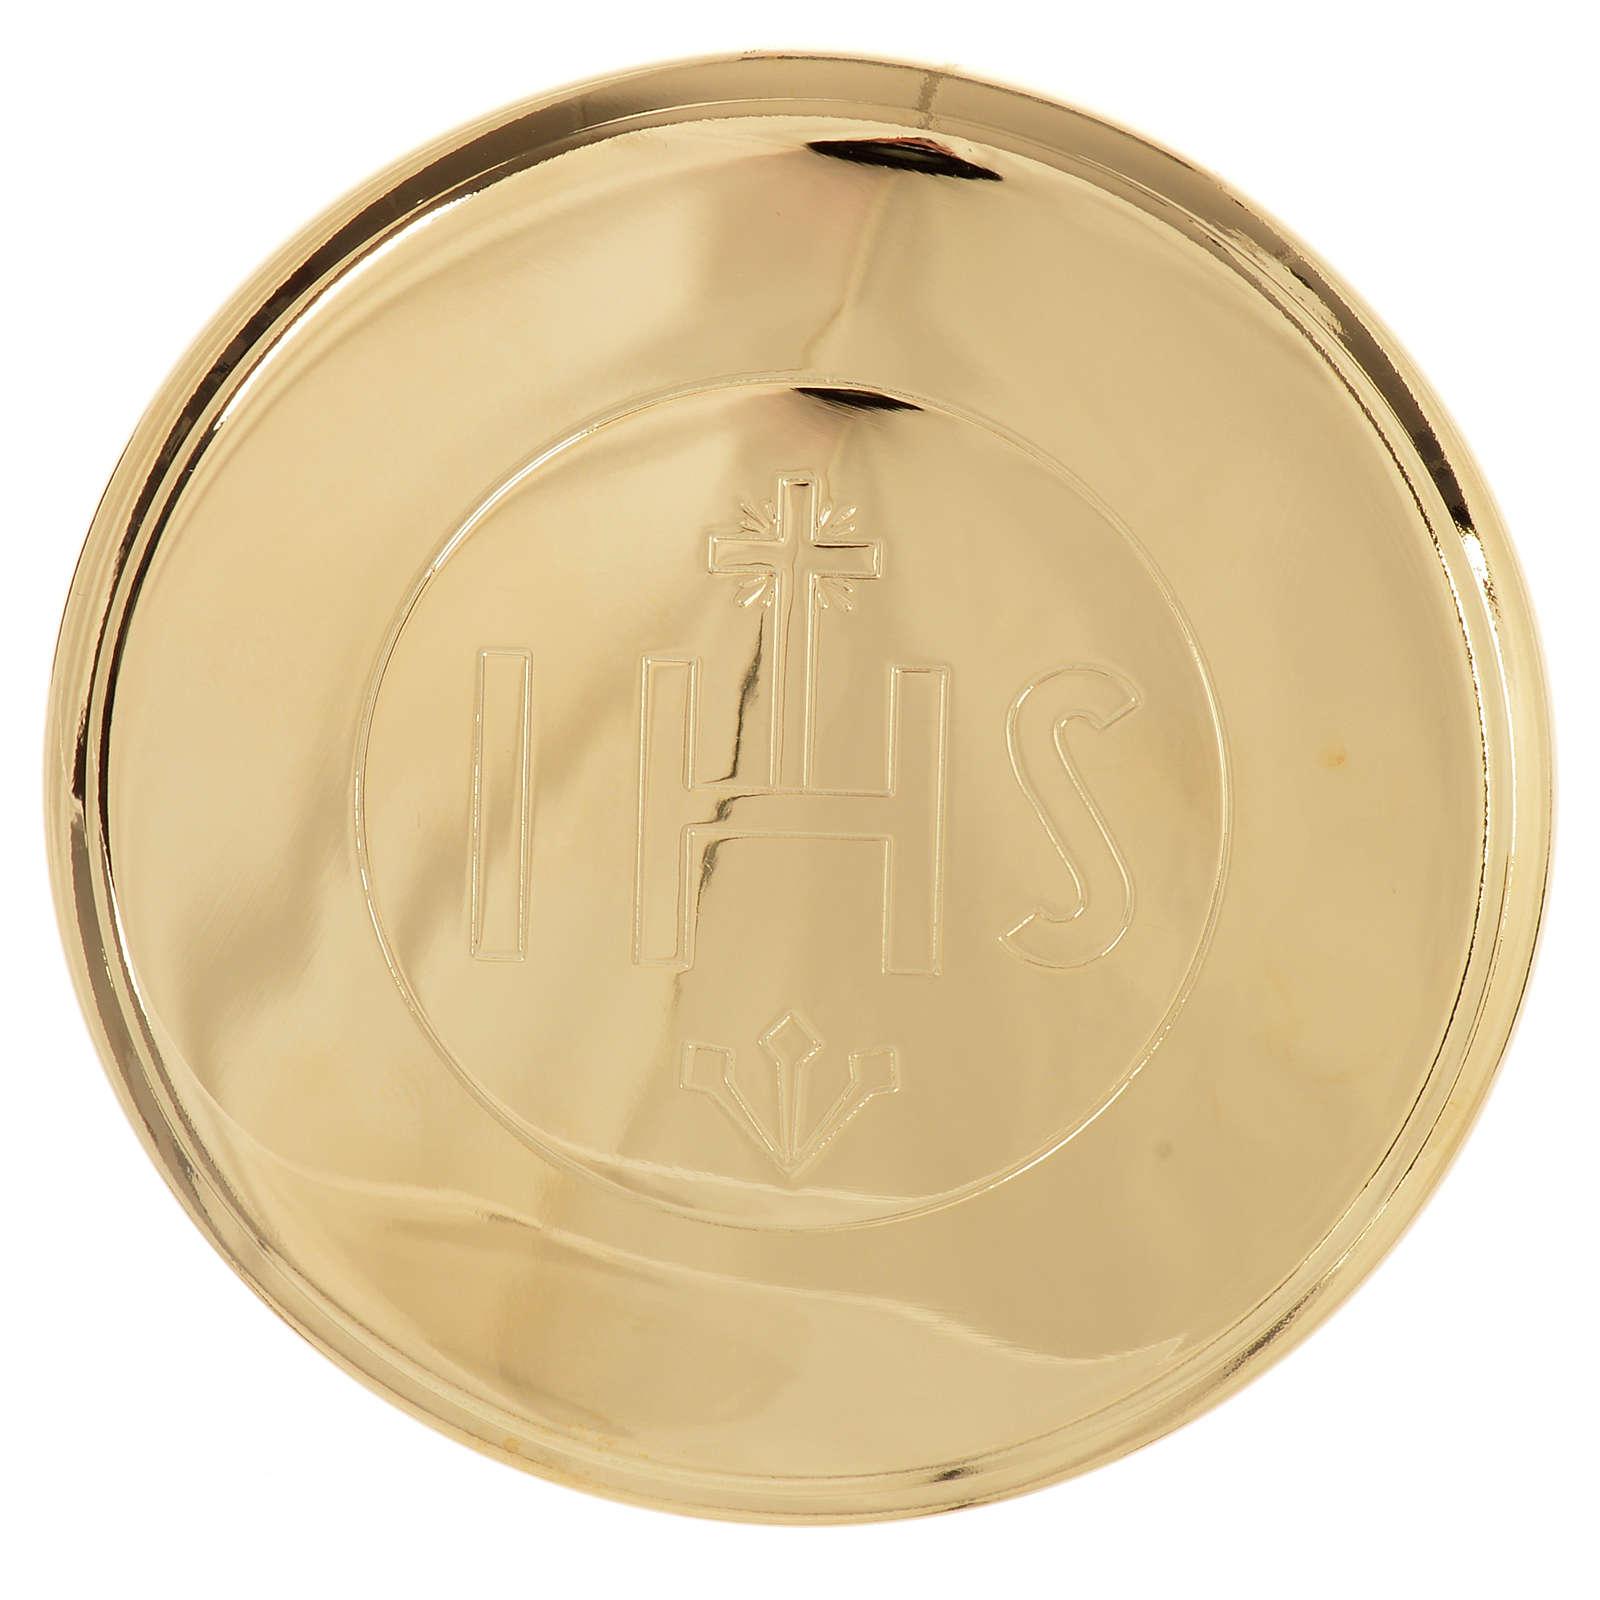 Custode hostie laiton doré IHS diamètre 7 cm 3